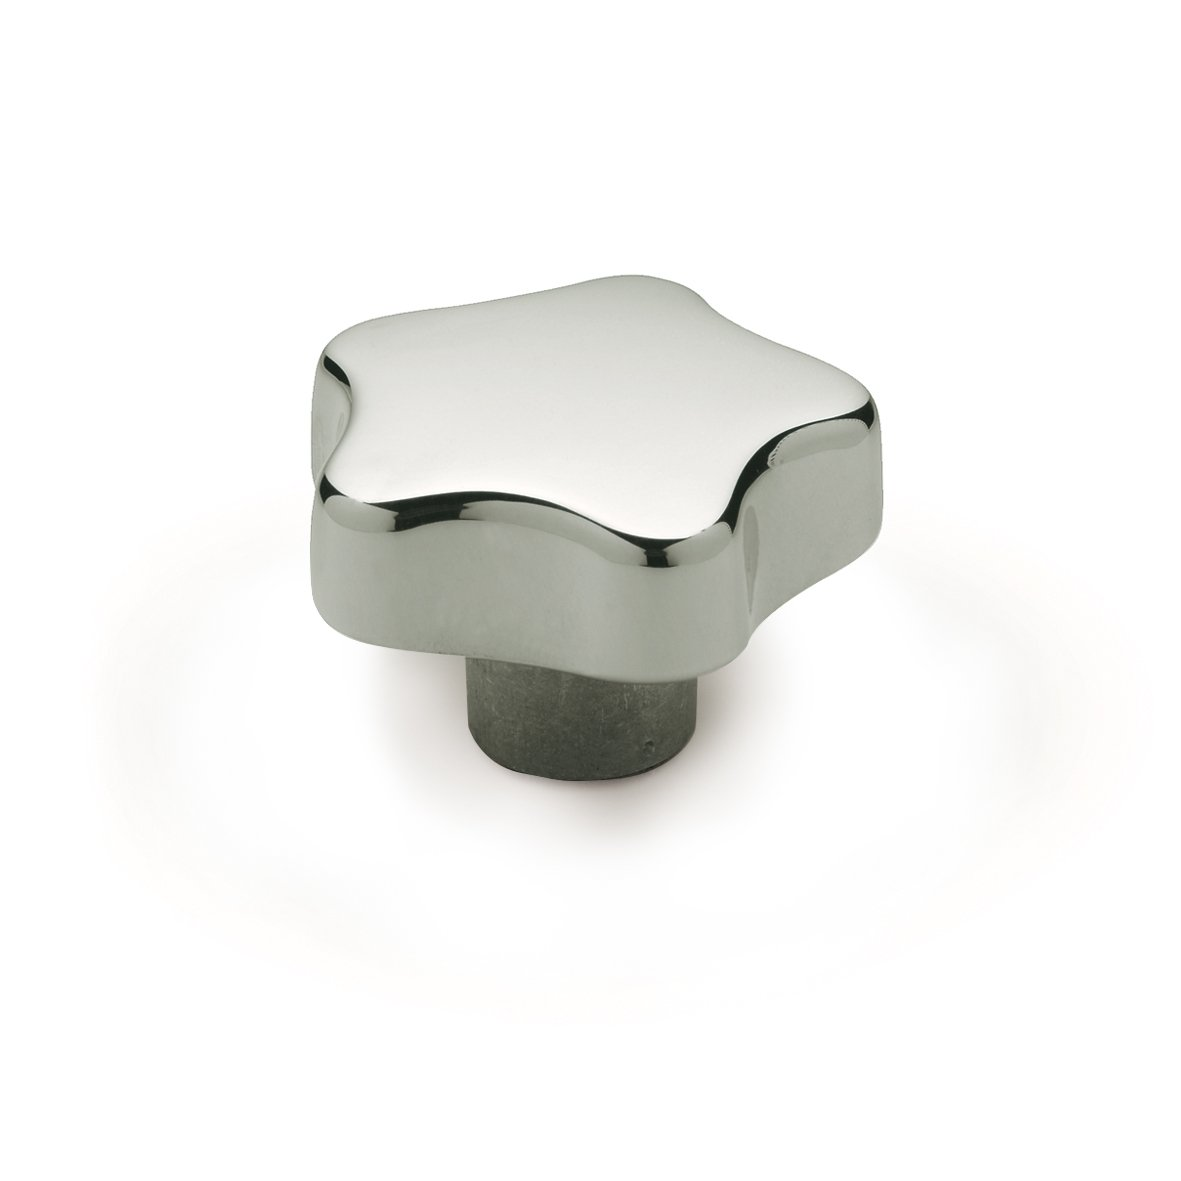 JW Winco Aluminum 6082 Tapped Hand Knob, Threaded Hole, M12 x 1.75 Thread Size x 28mm Thread Depth, 70mm Head Diameter, Polished Finish (Pack of 1)